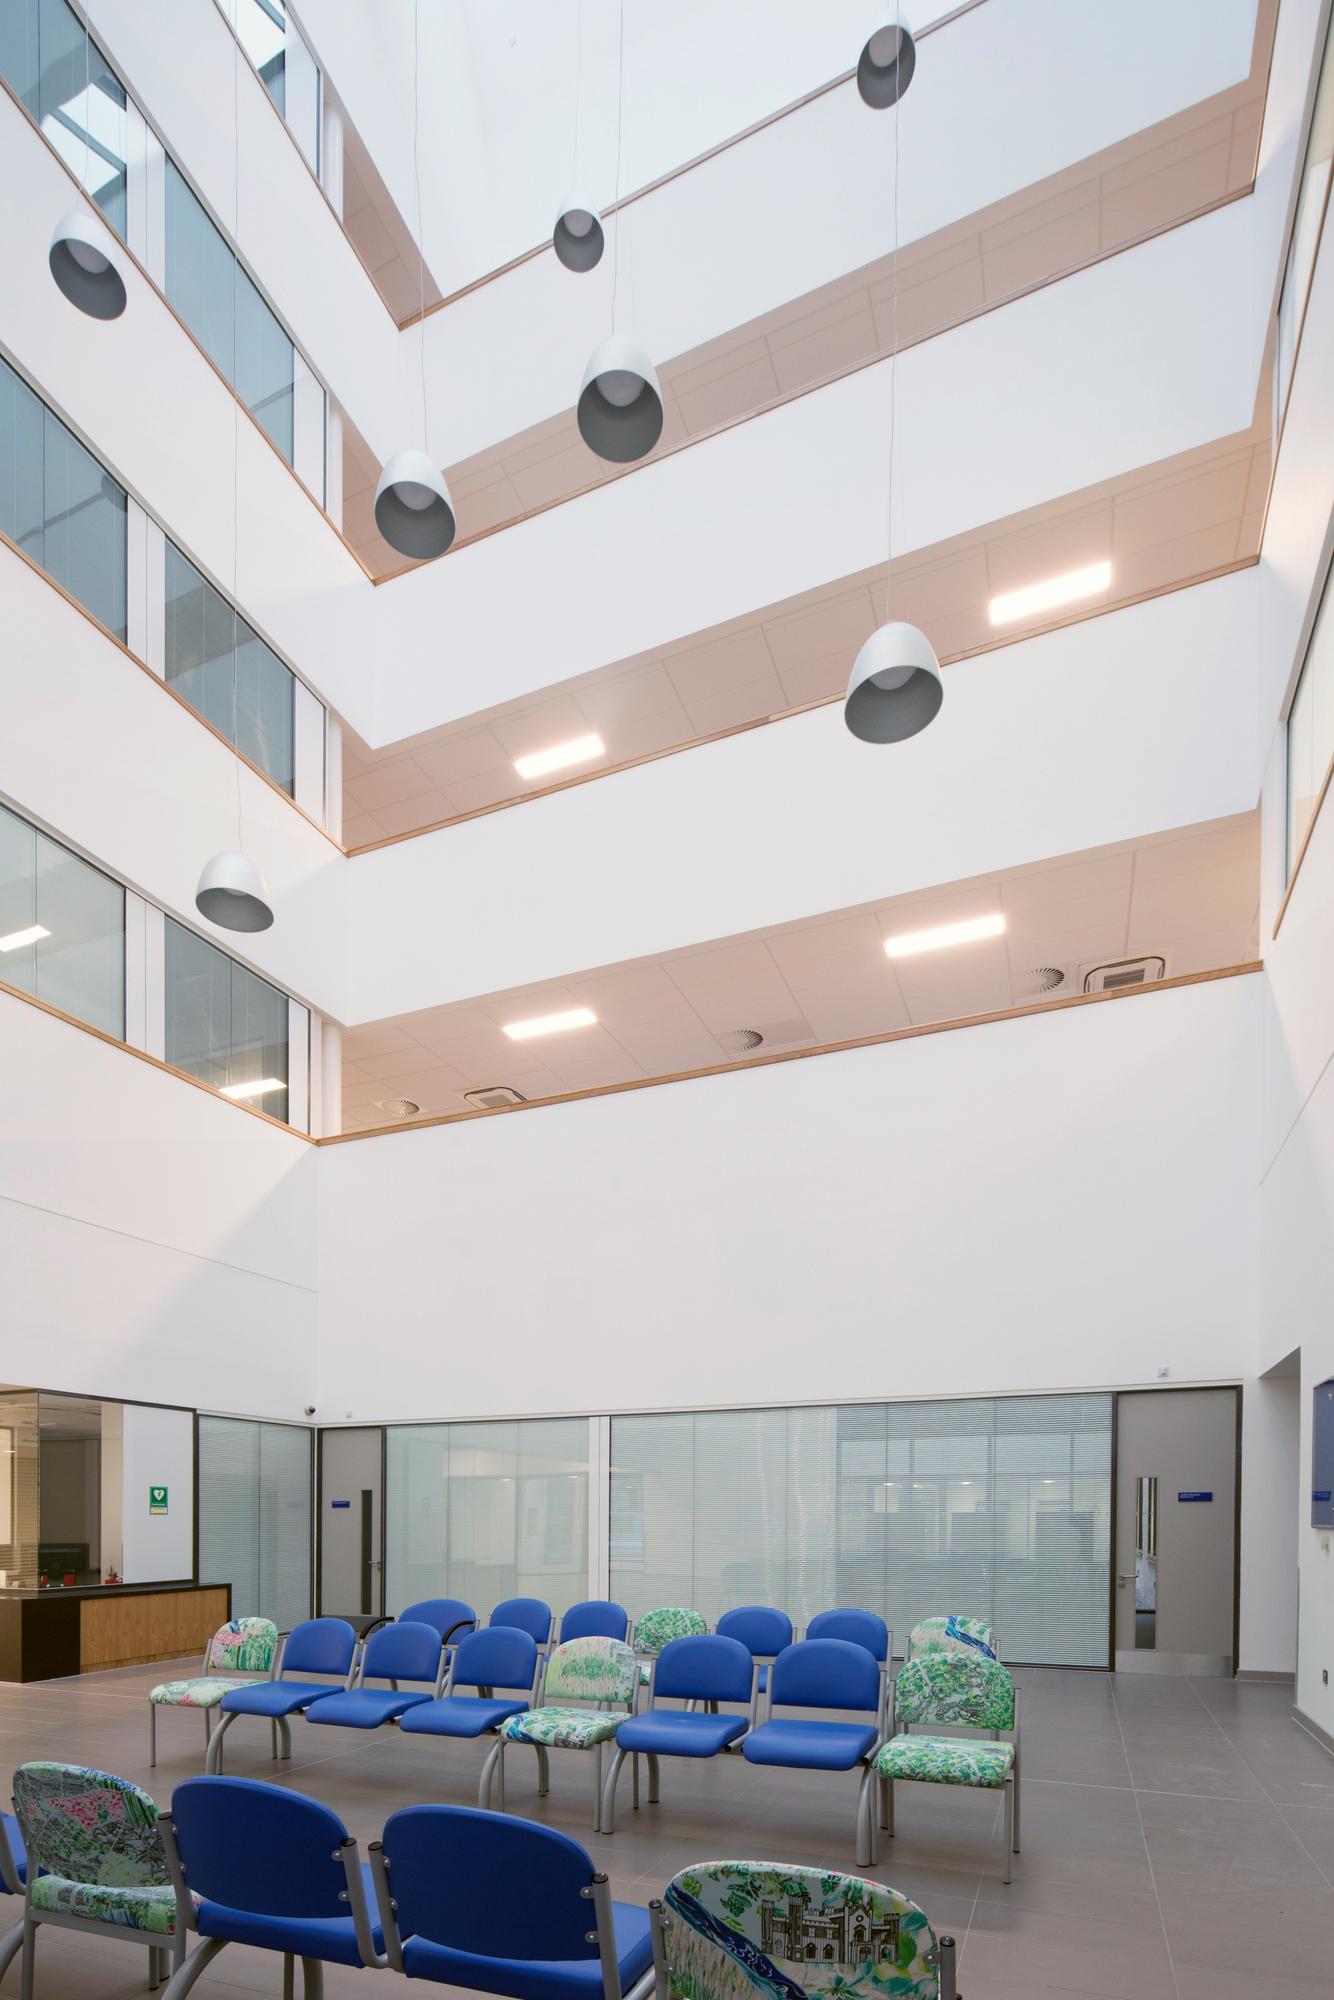 New Community Health Centre Wishaw